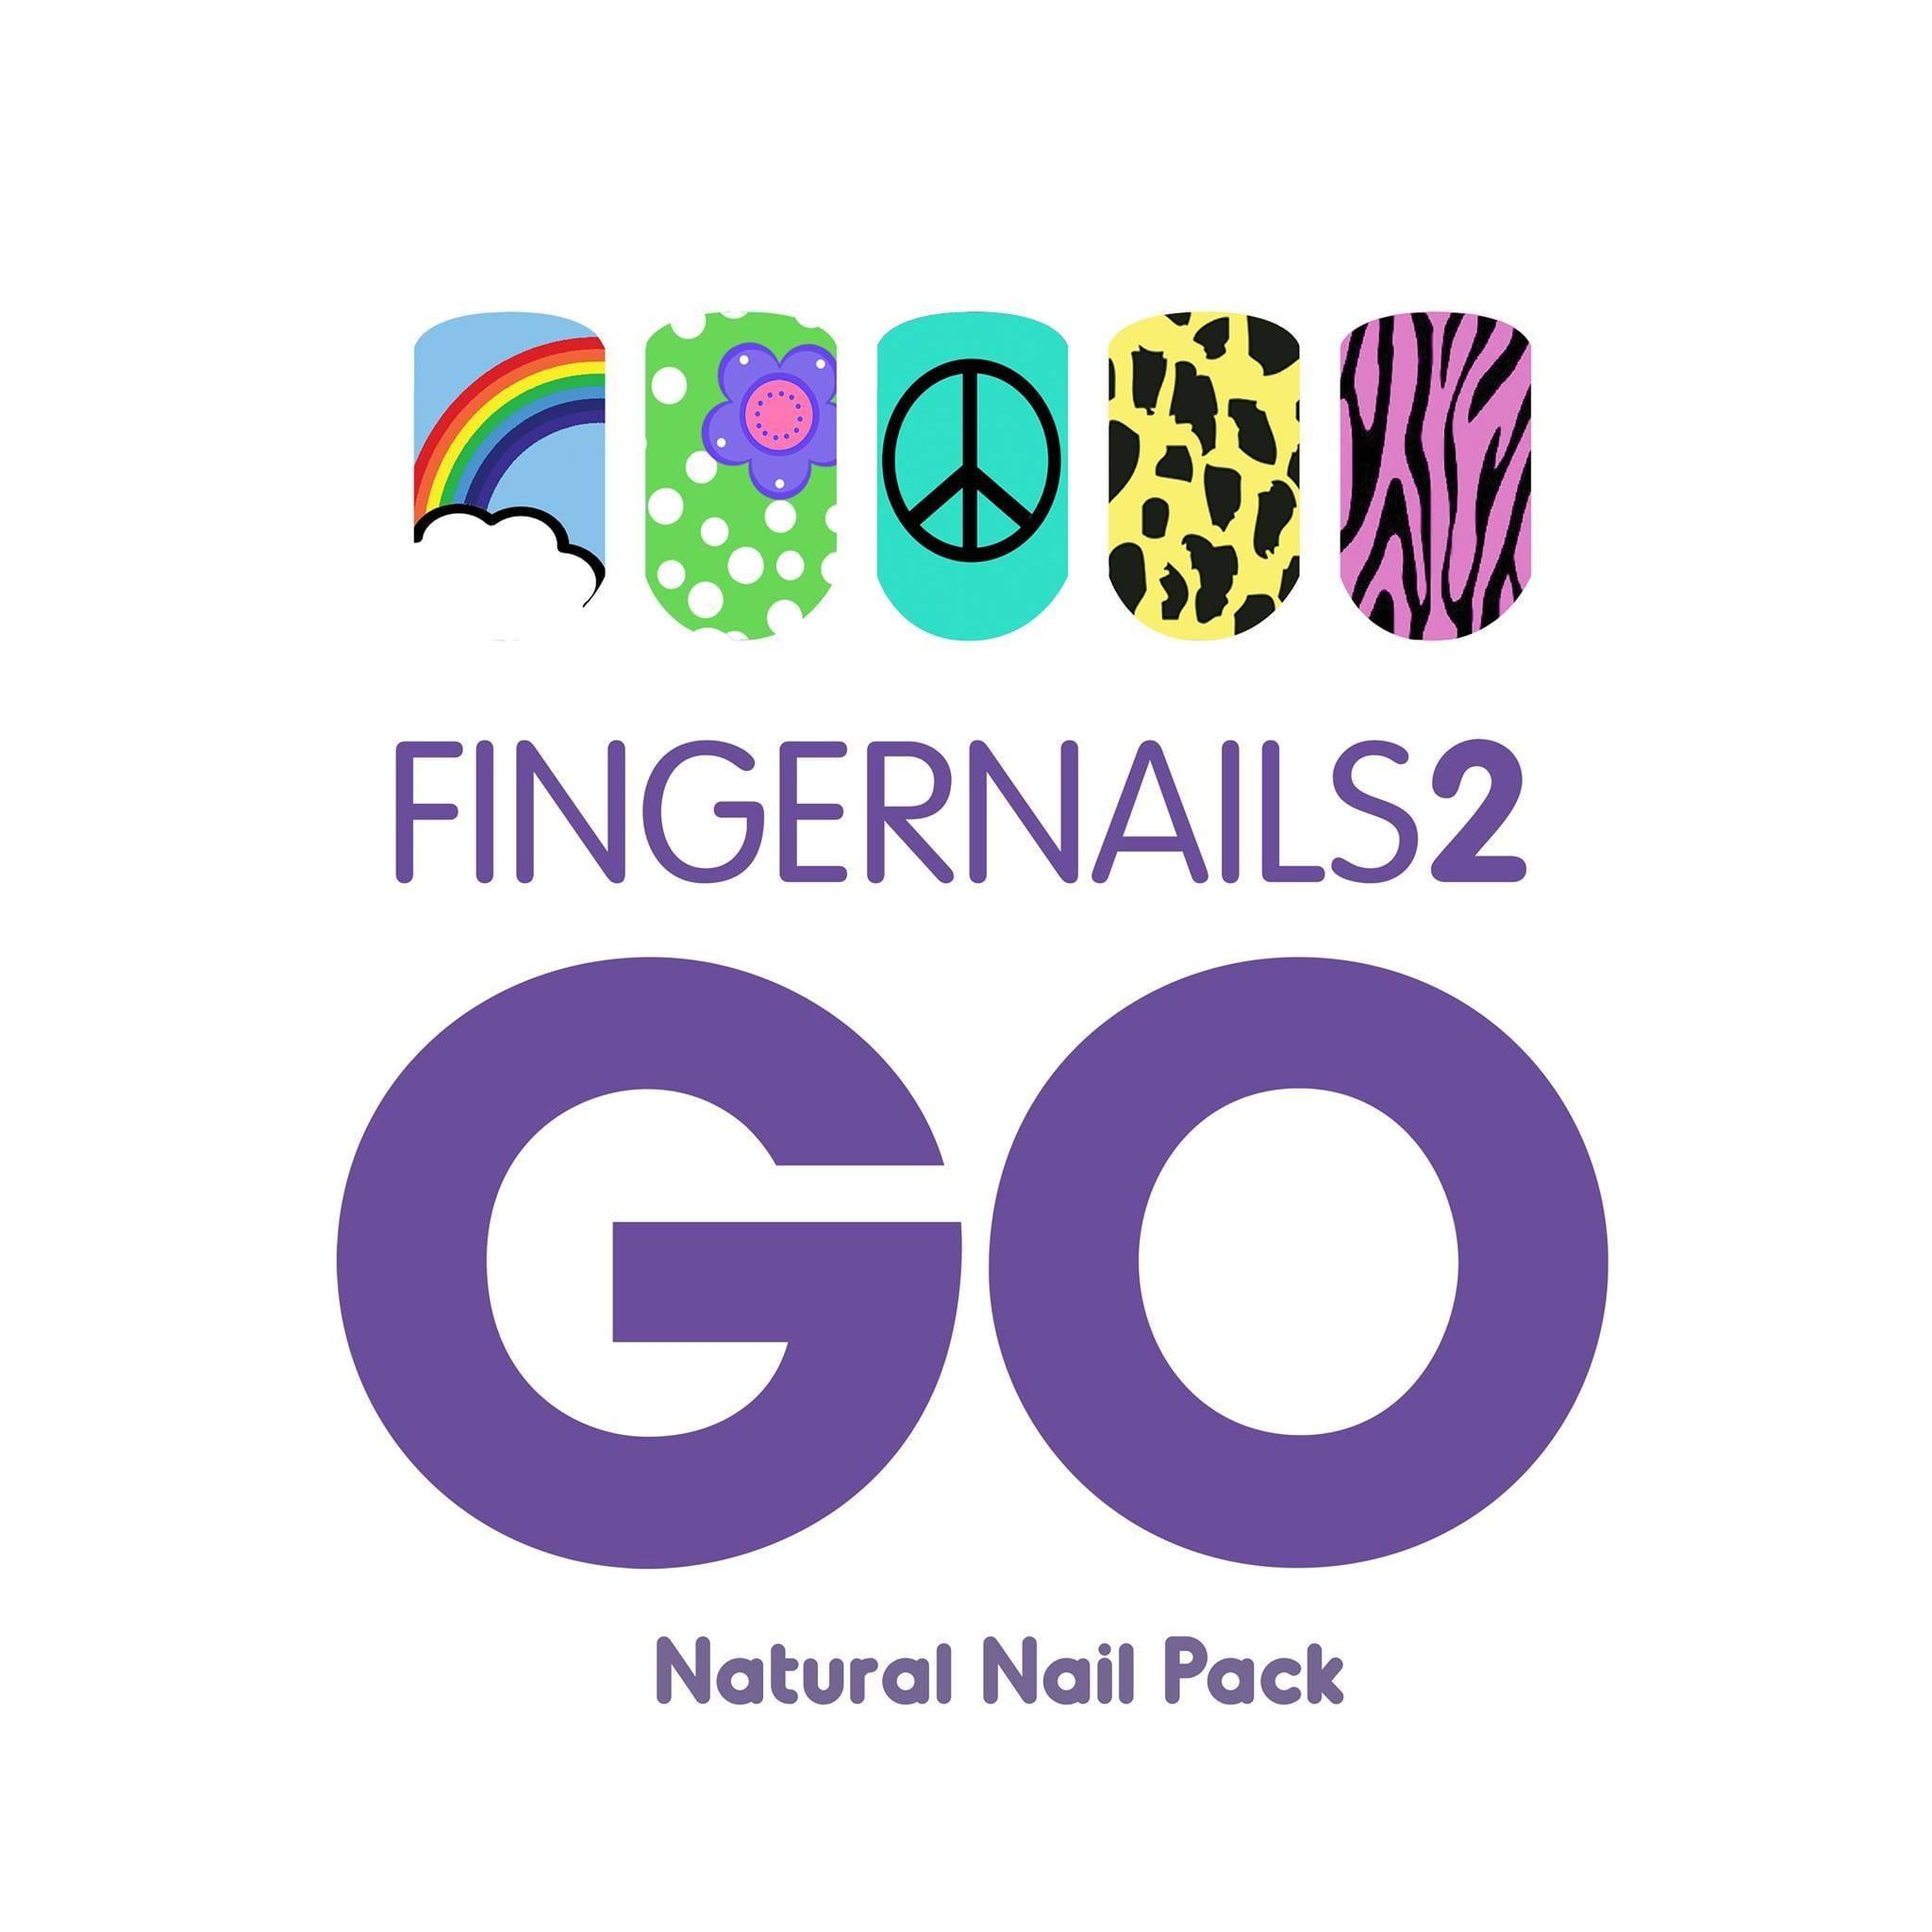 Fingernails2go   Gangnam-gu, Seoul